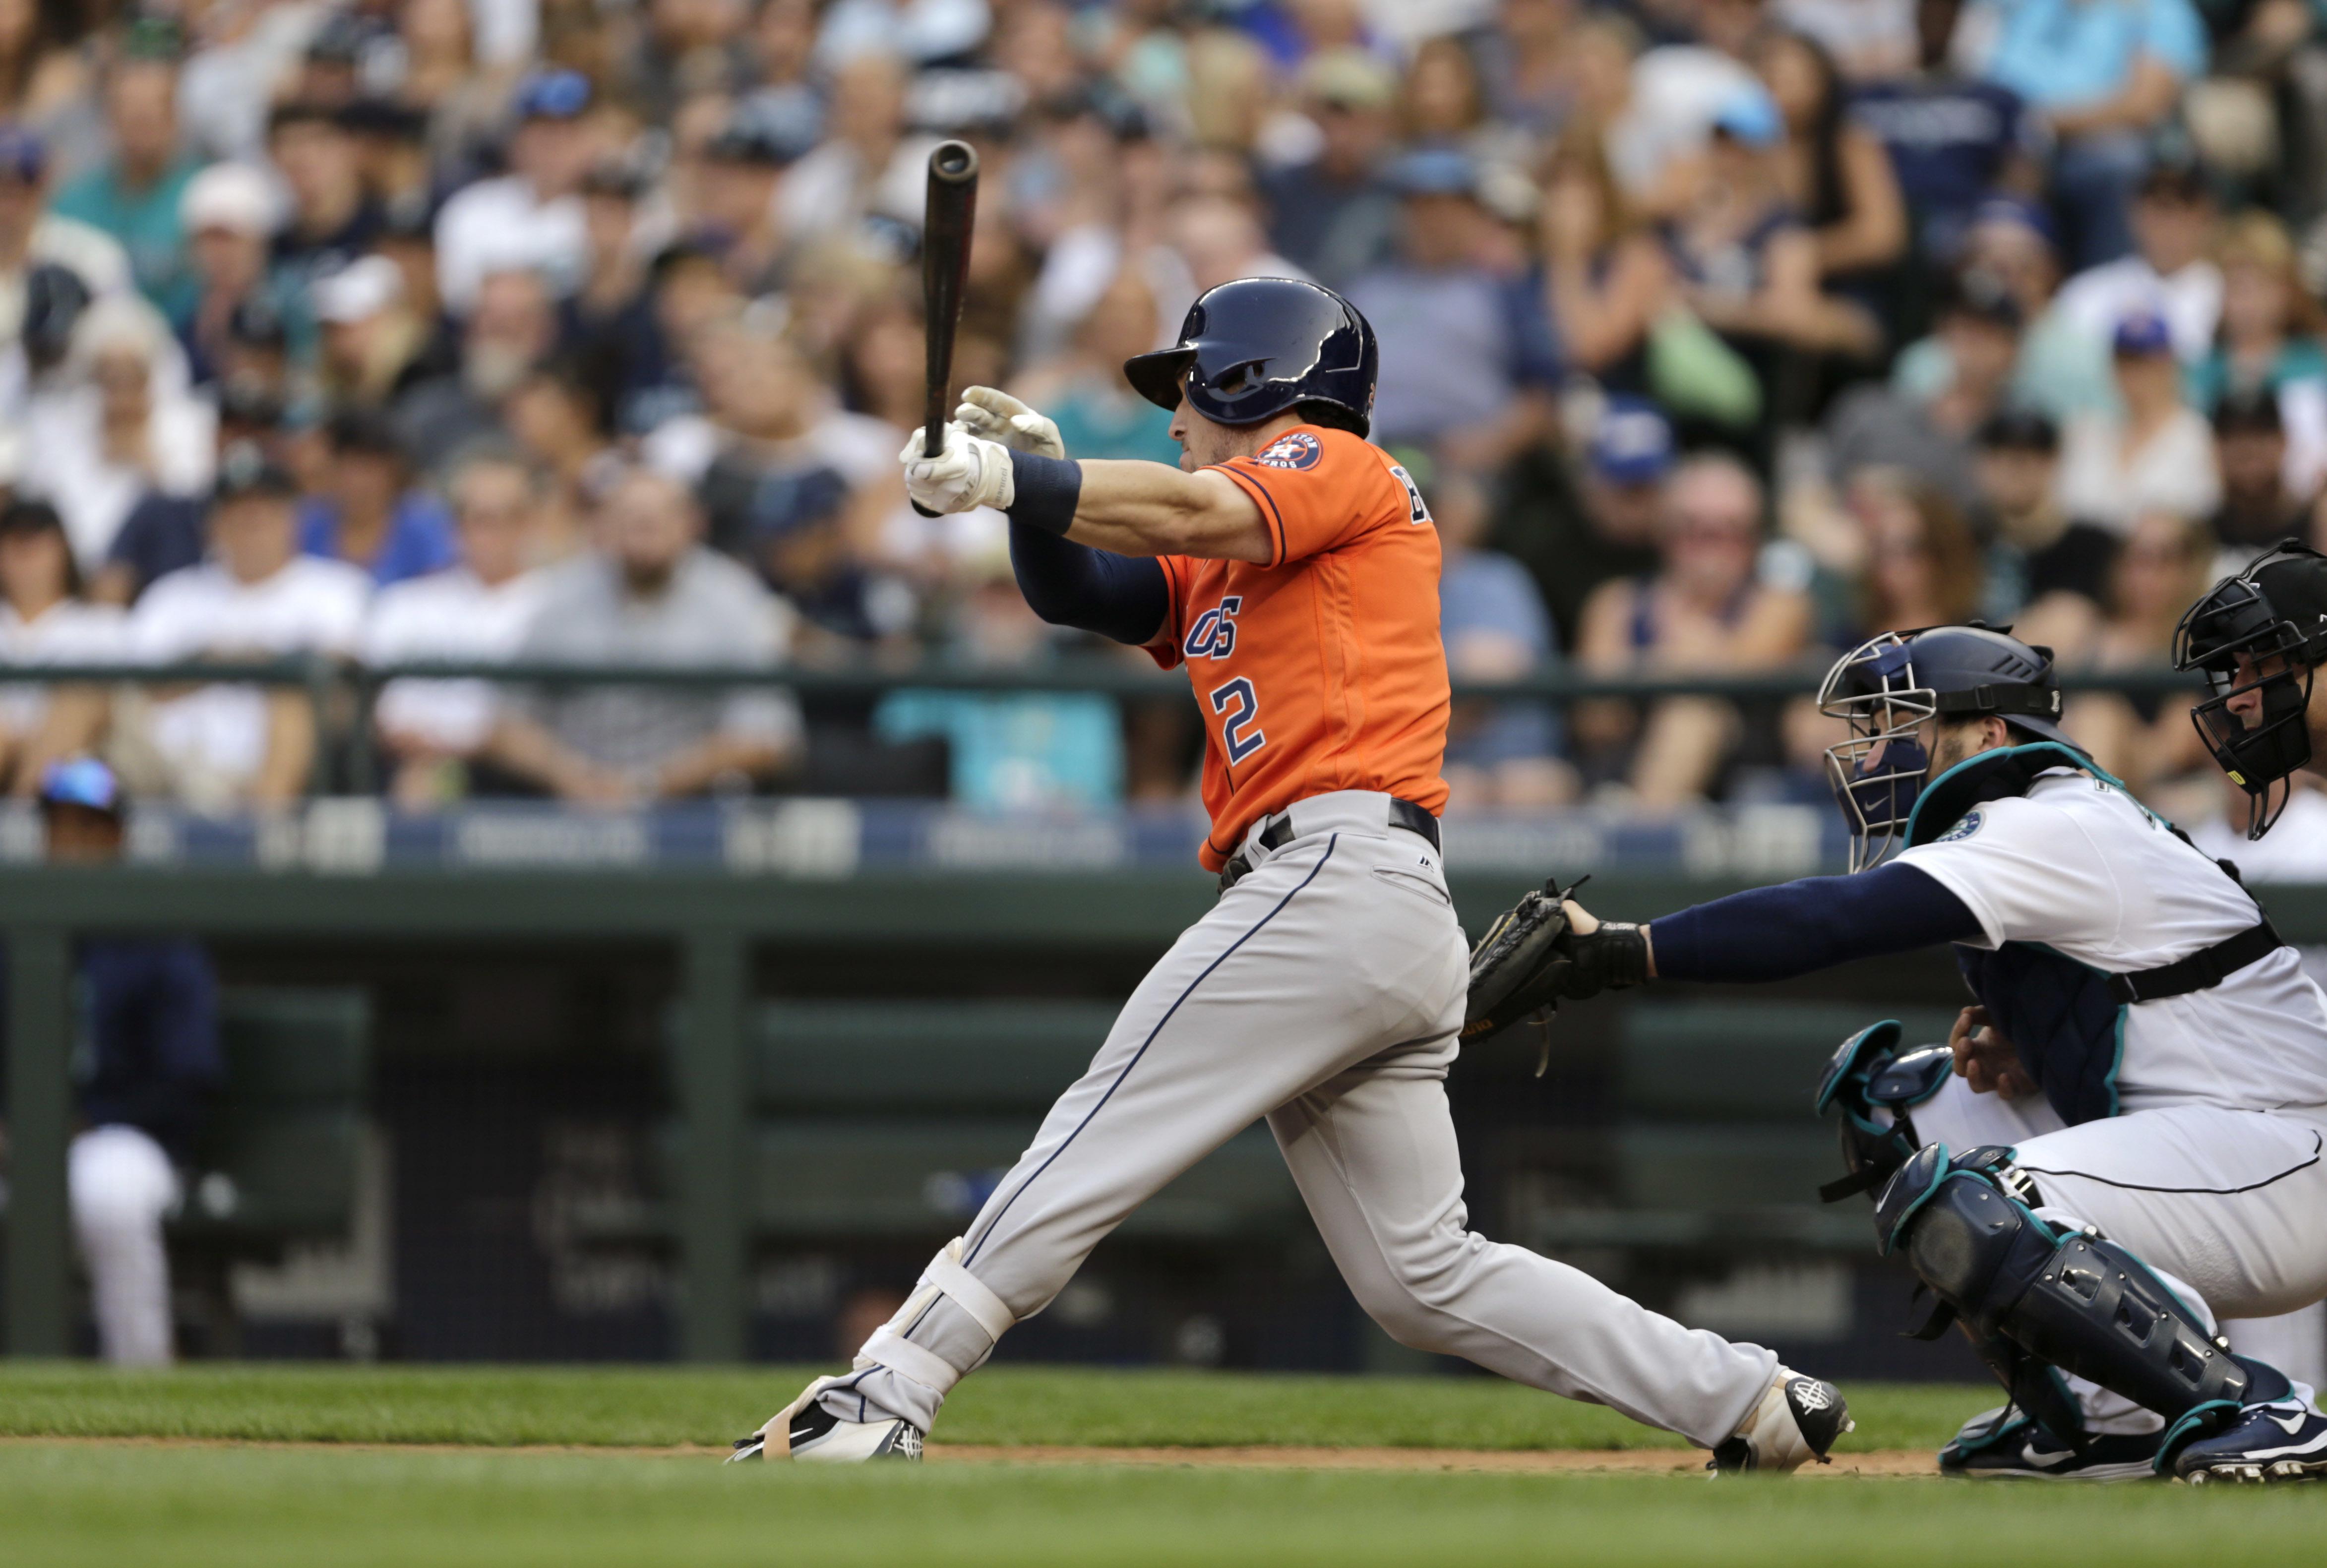 Astros_mariners_baseball_56212